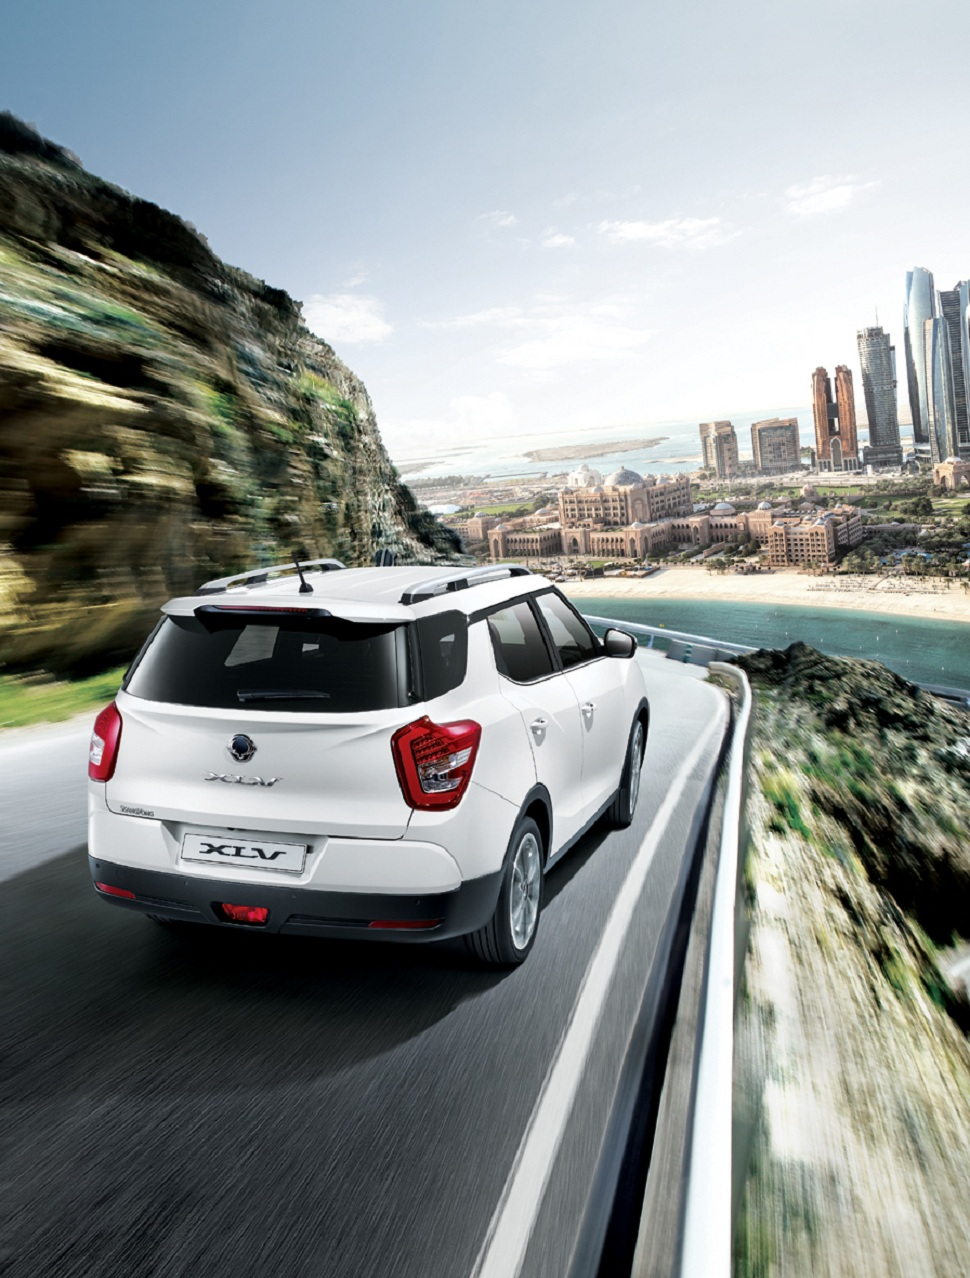 prix_ssangyong_tunisie_automobile-tn